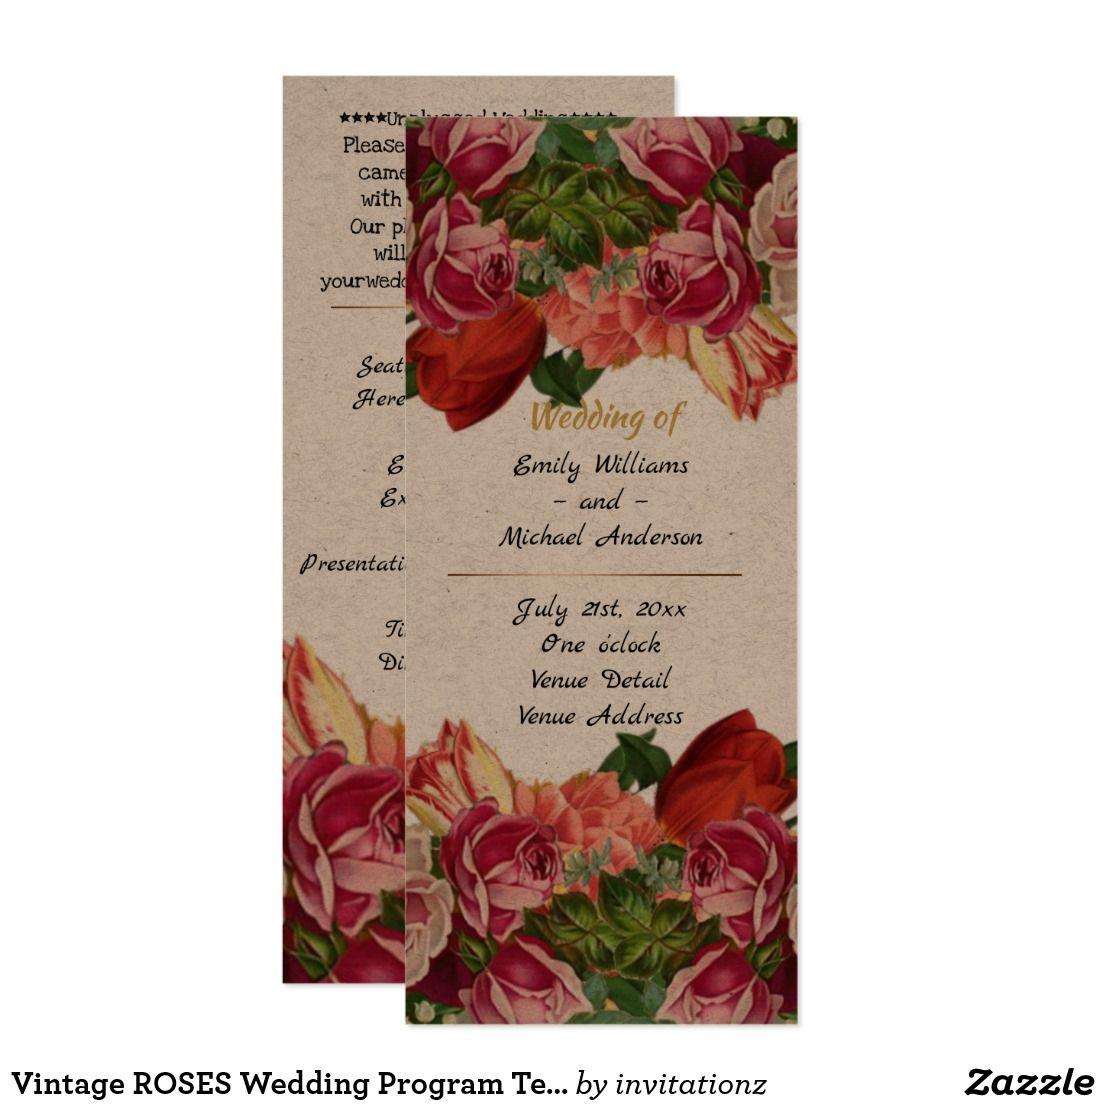 Vintage ROSES Wedding Program Template Kraft | Trending Wedding ...